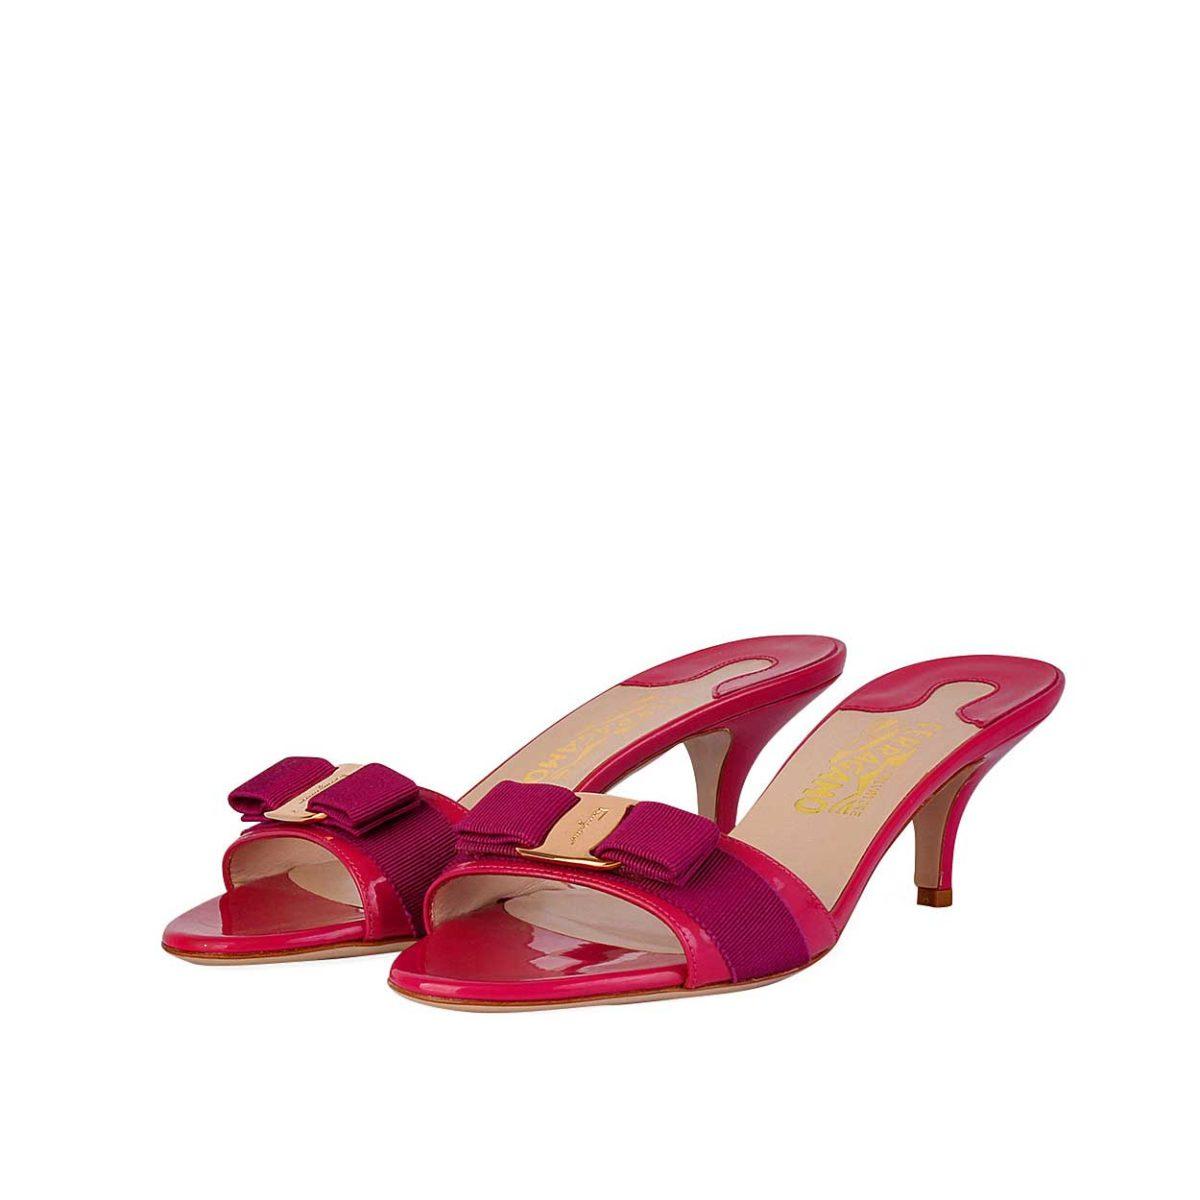 ef4468fb22 SALVATORE FERRAGAMO Anemone Patent Kitten Heel Sandals - S: 39 (6 ...